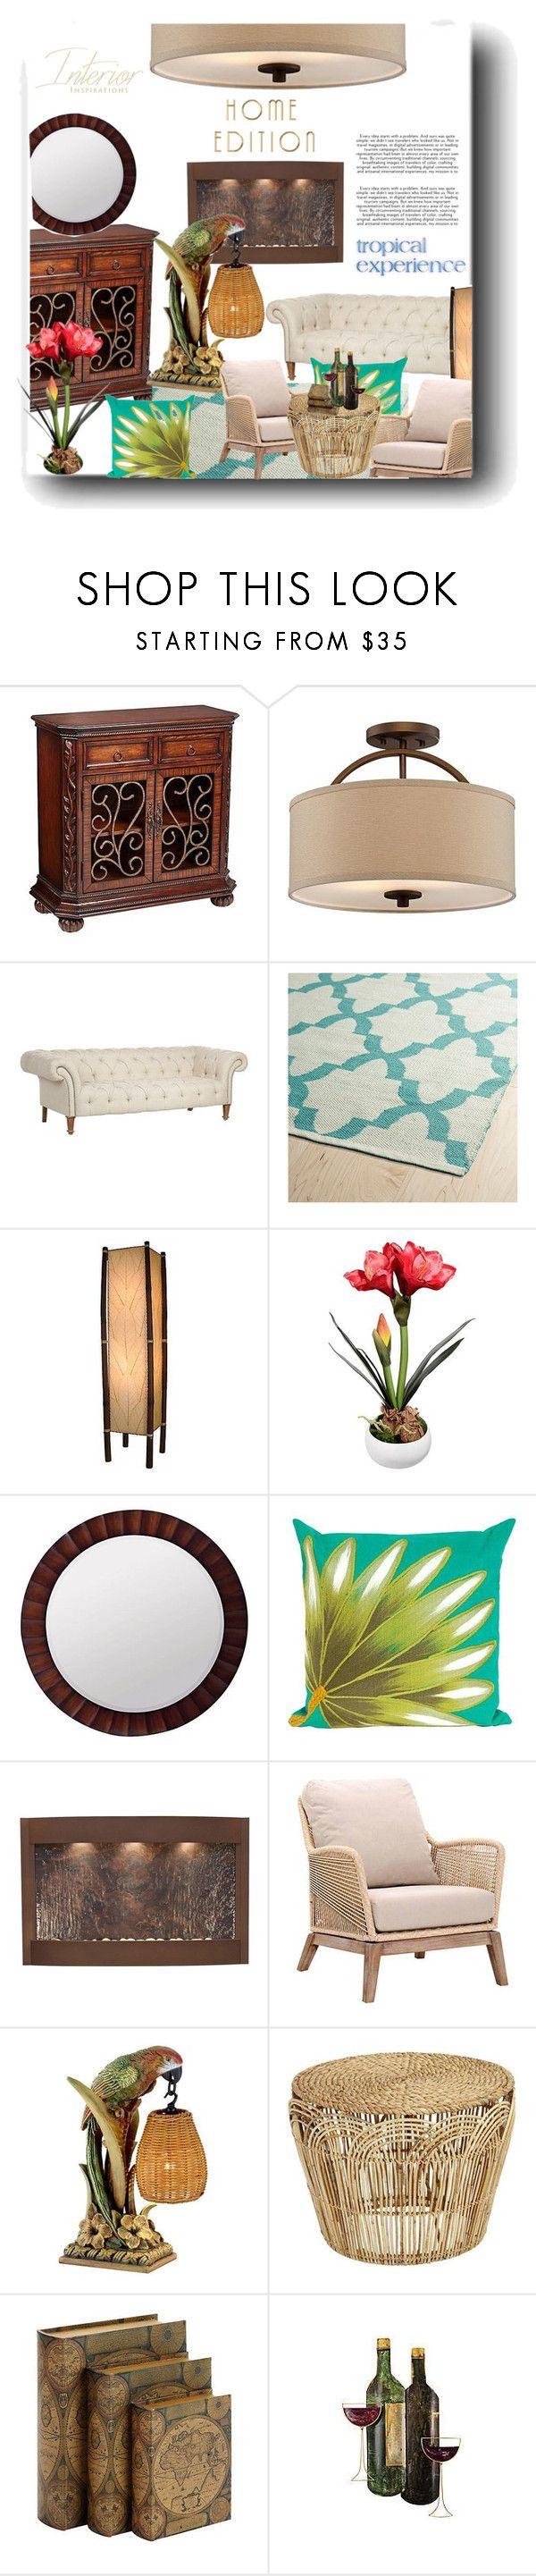 """Tropical Style"" by snezanamilunovic ❤ liked on Polyvore featuring interior, interiors, interior design, home, home decor, interior decorating, Possini Euro Design, Kaleen, Cooper Classics and Adagio"